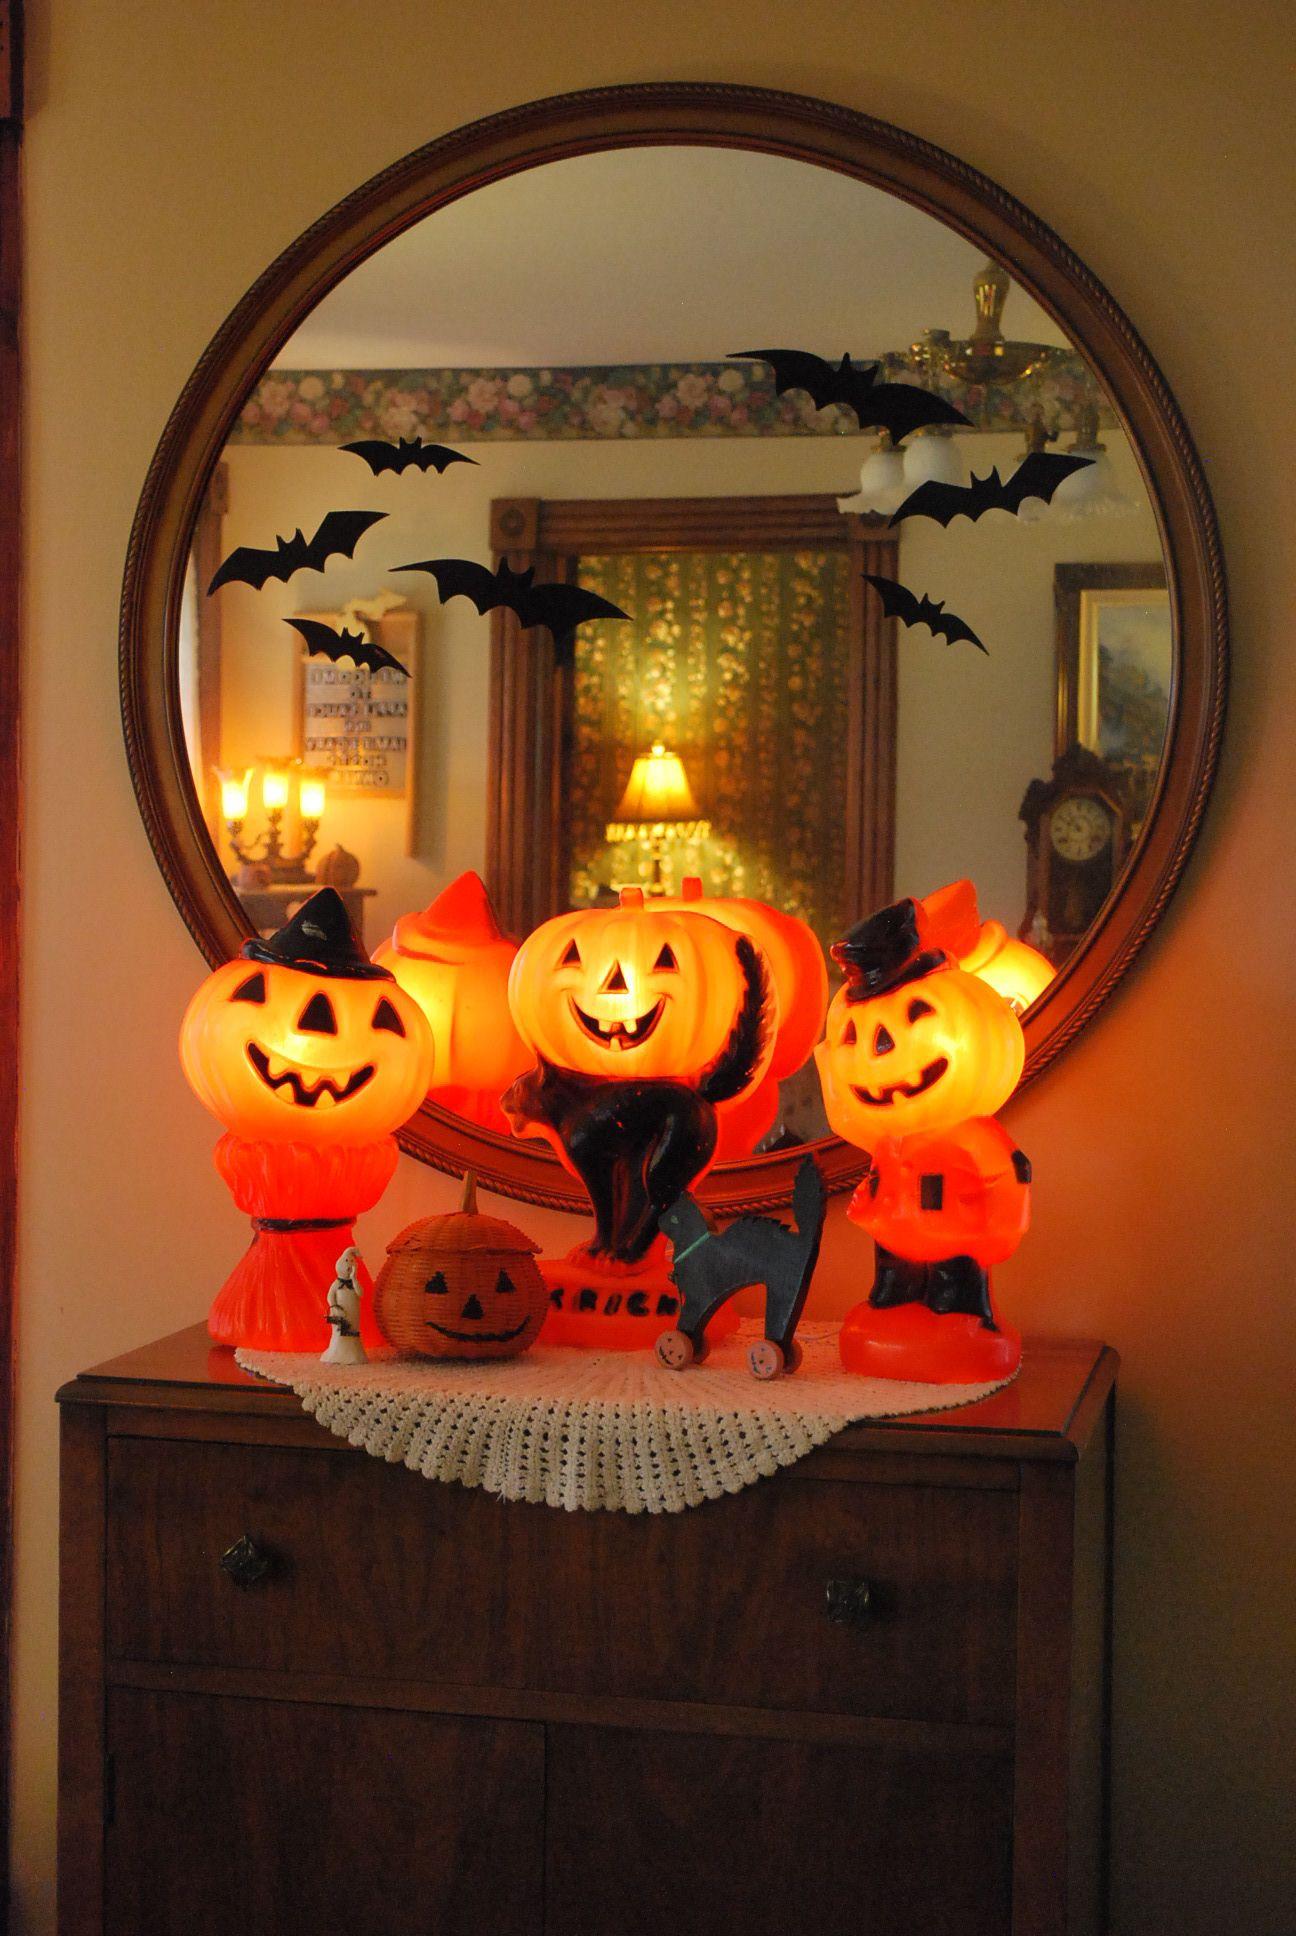 My vintage lighted plastic pumpkin collection Halloween